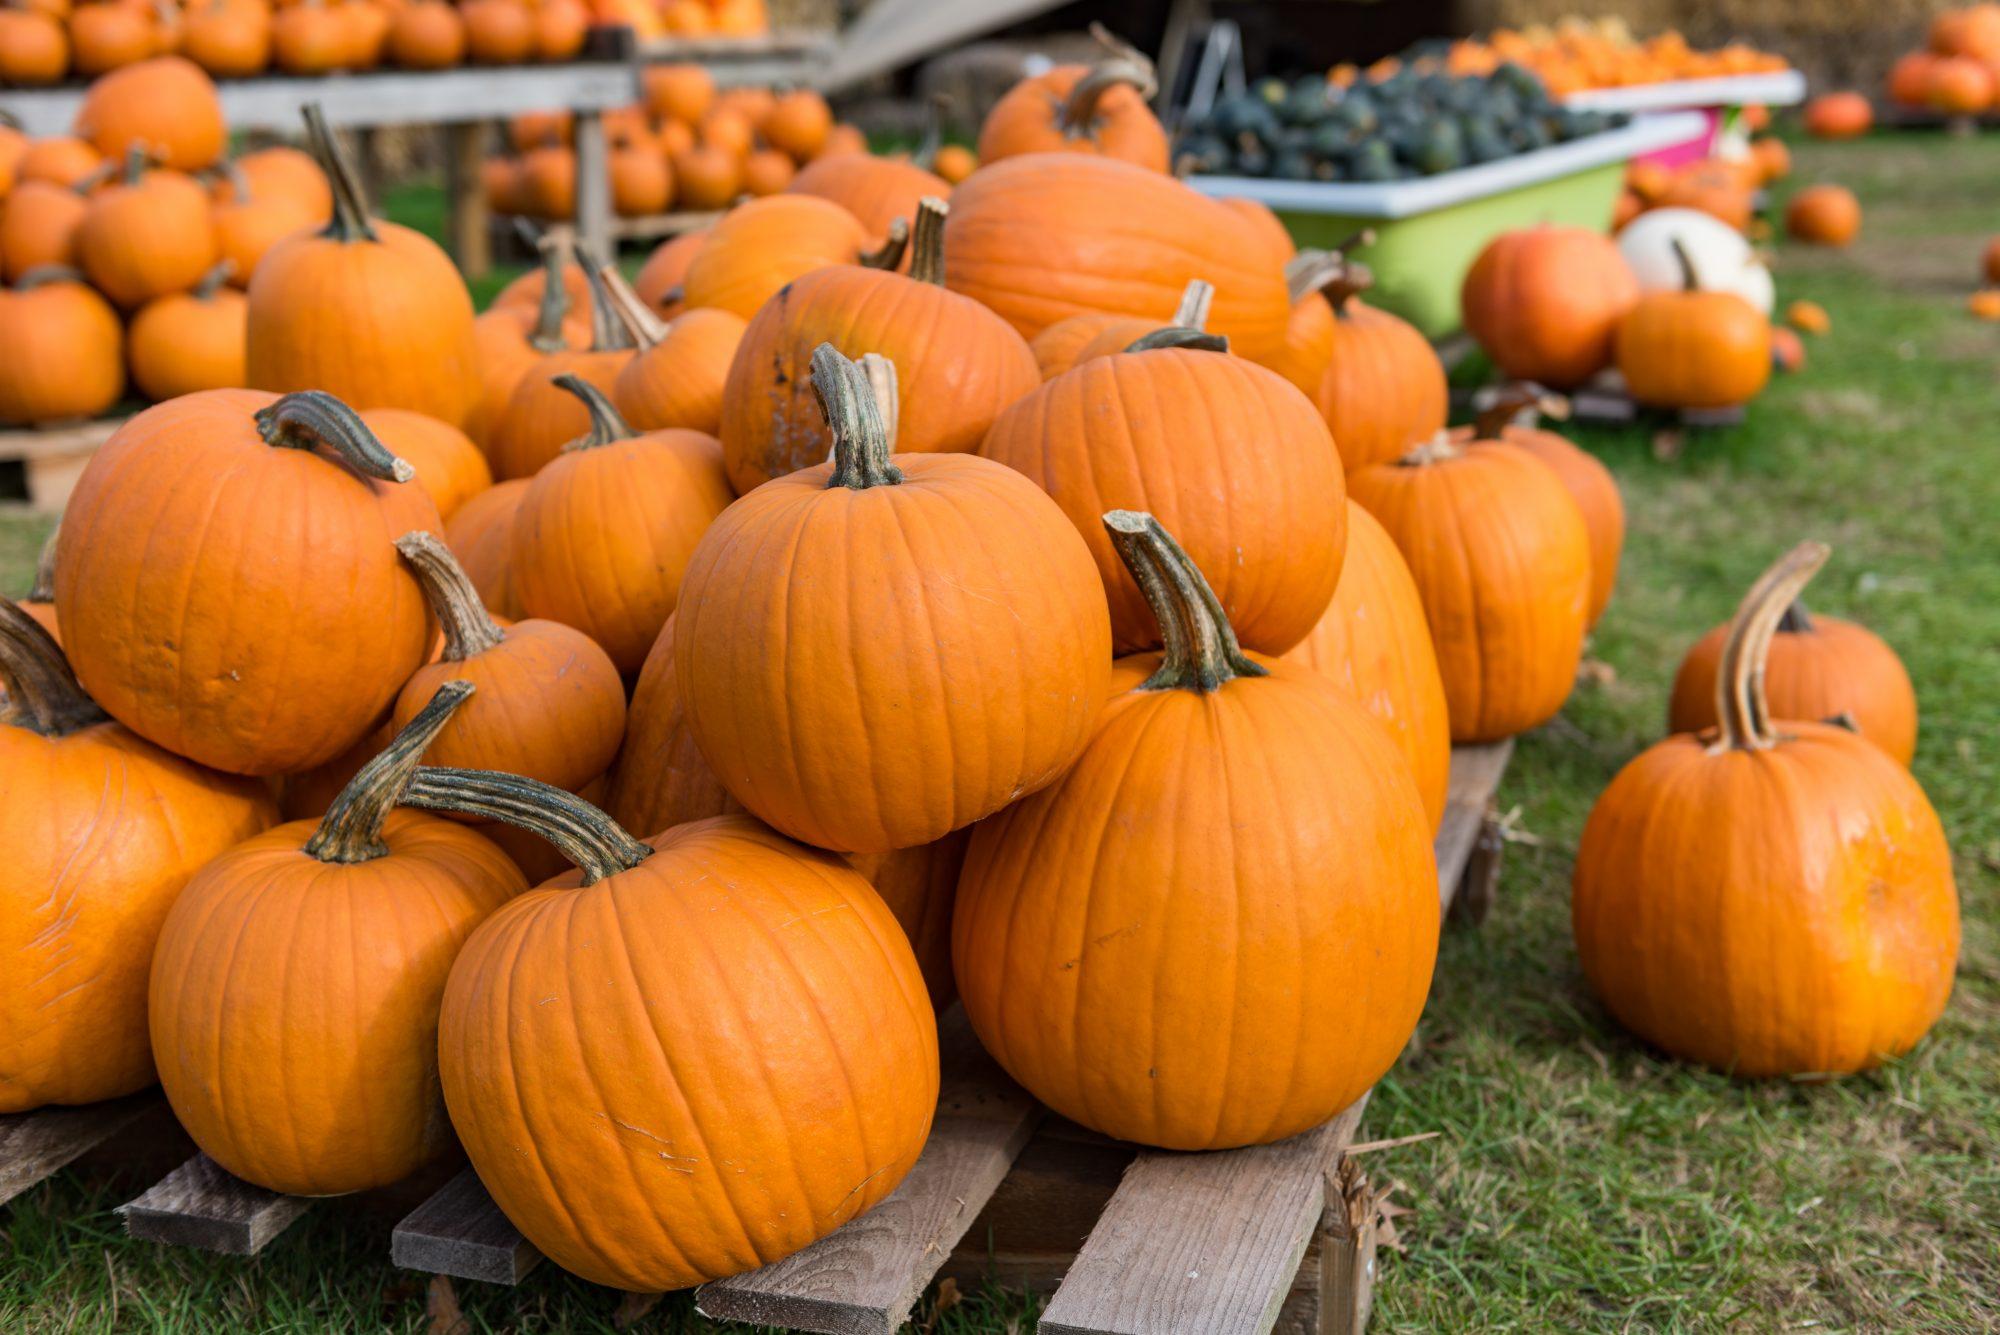 10232019_Getty Pumpkins Image